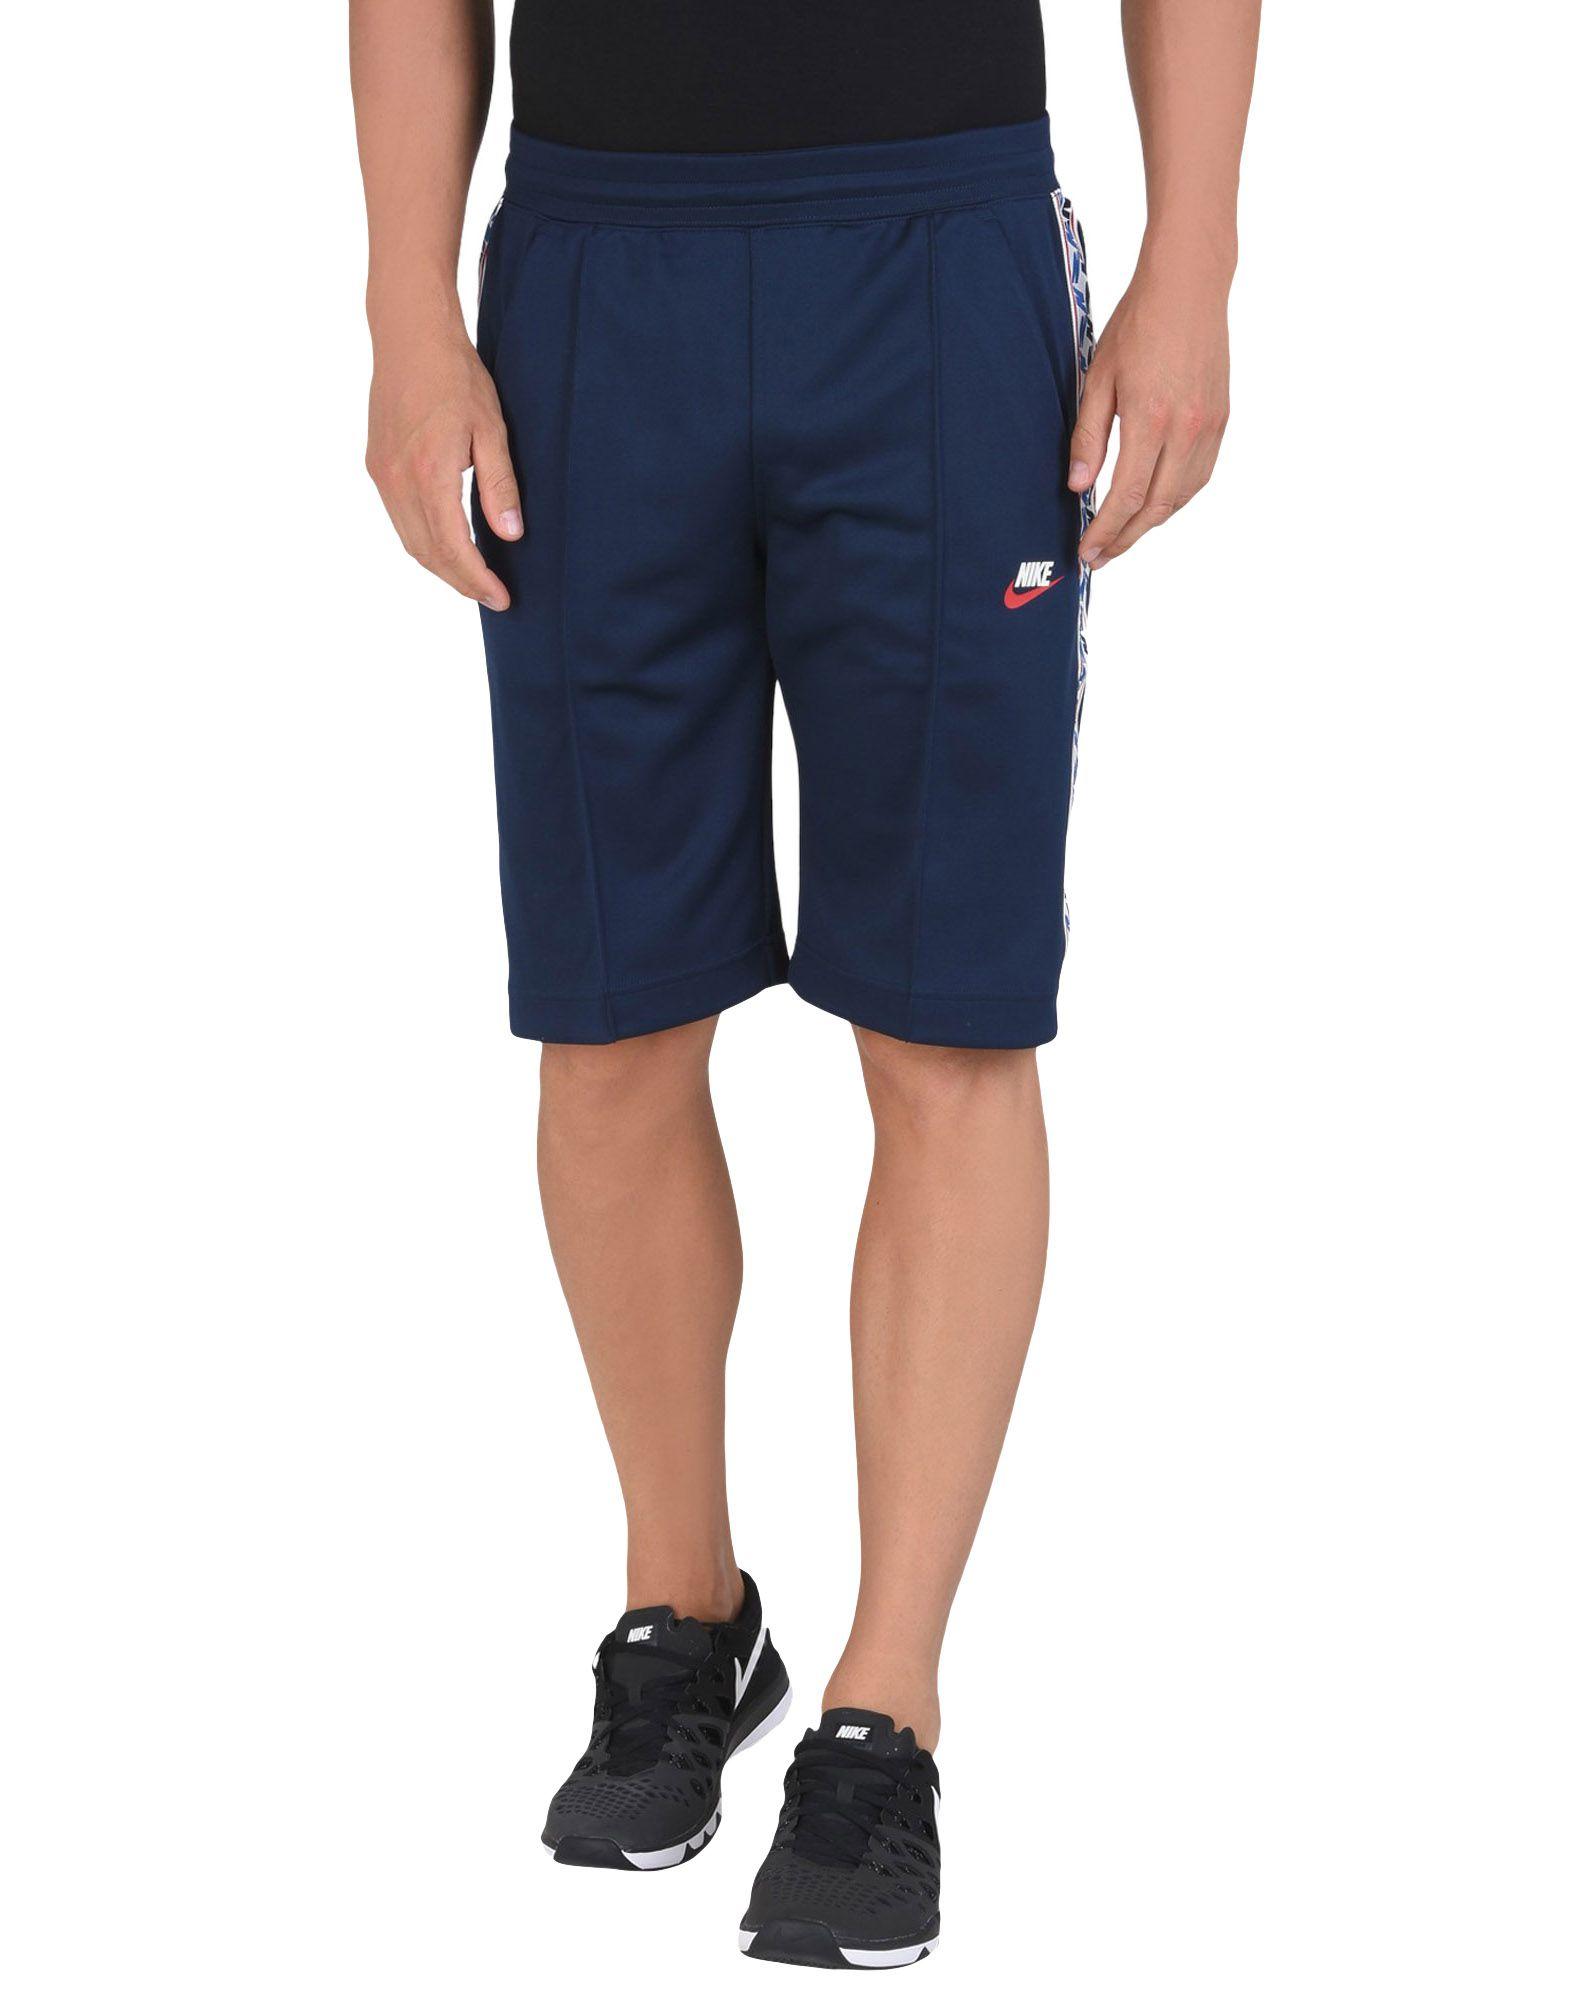 Pantalone Sportivo Nike Nike Taped Short Poly - uomo - 13206420AM  günstigere preise